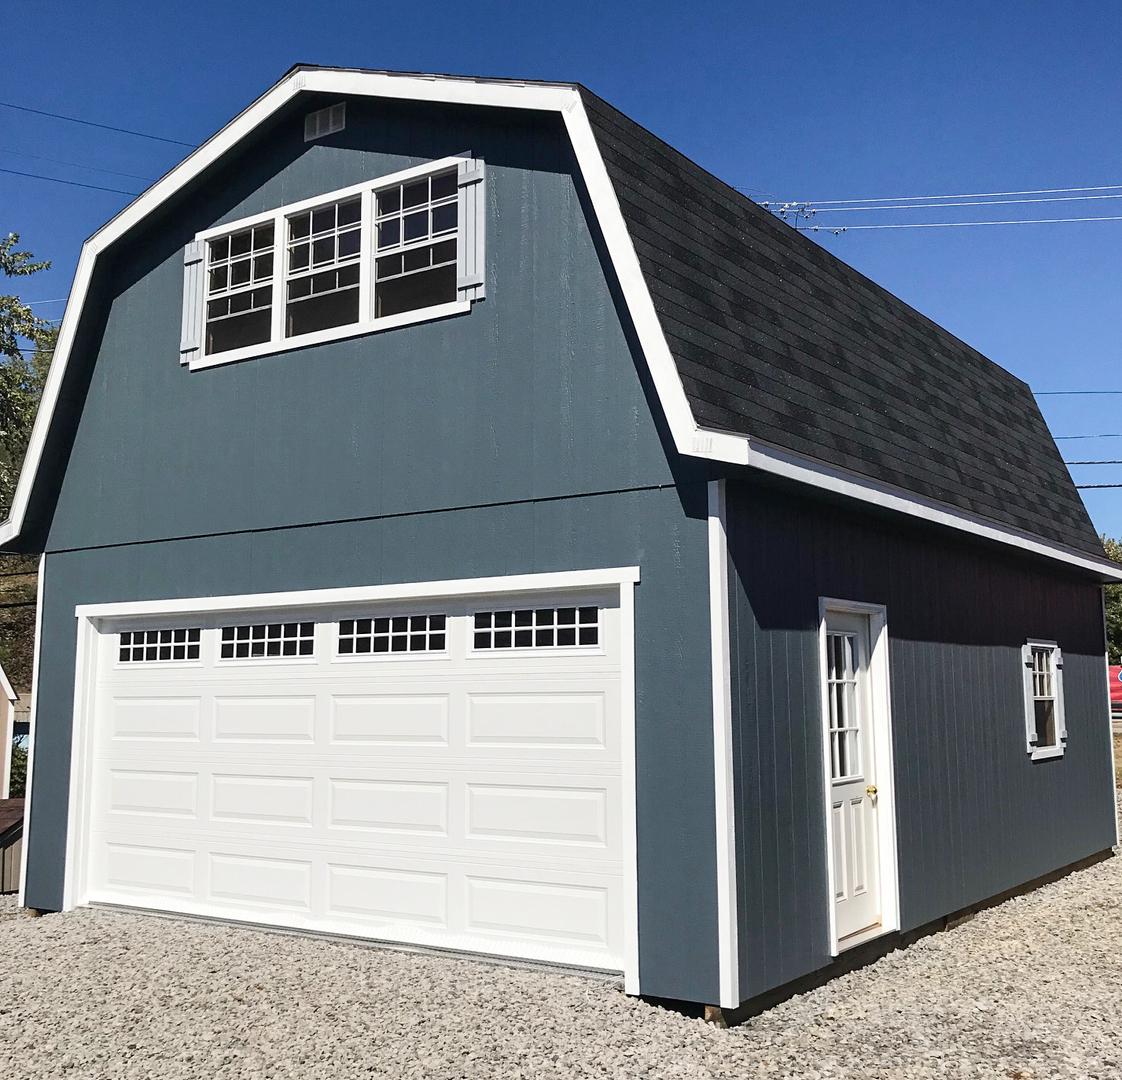 lp diy garages youtube barns watch smartside shed garage barn construction pole